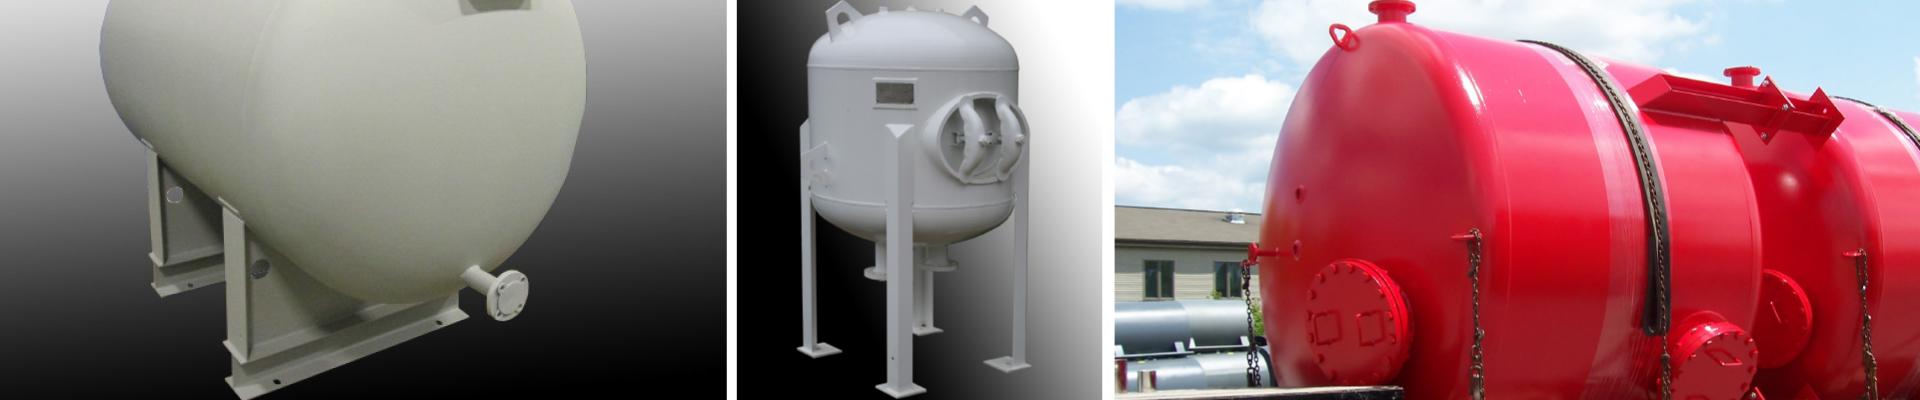 Specialty Asme Pressure Vessels Highland Tank